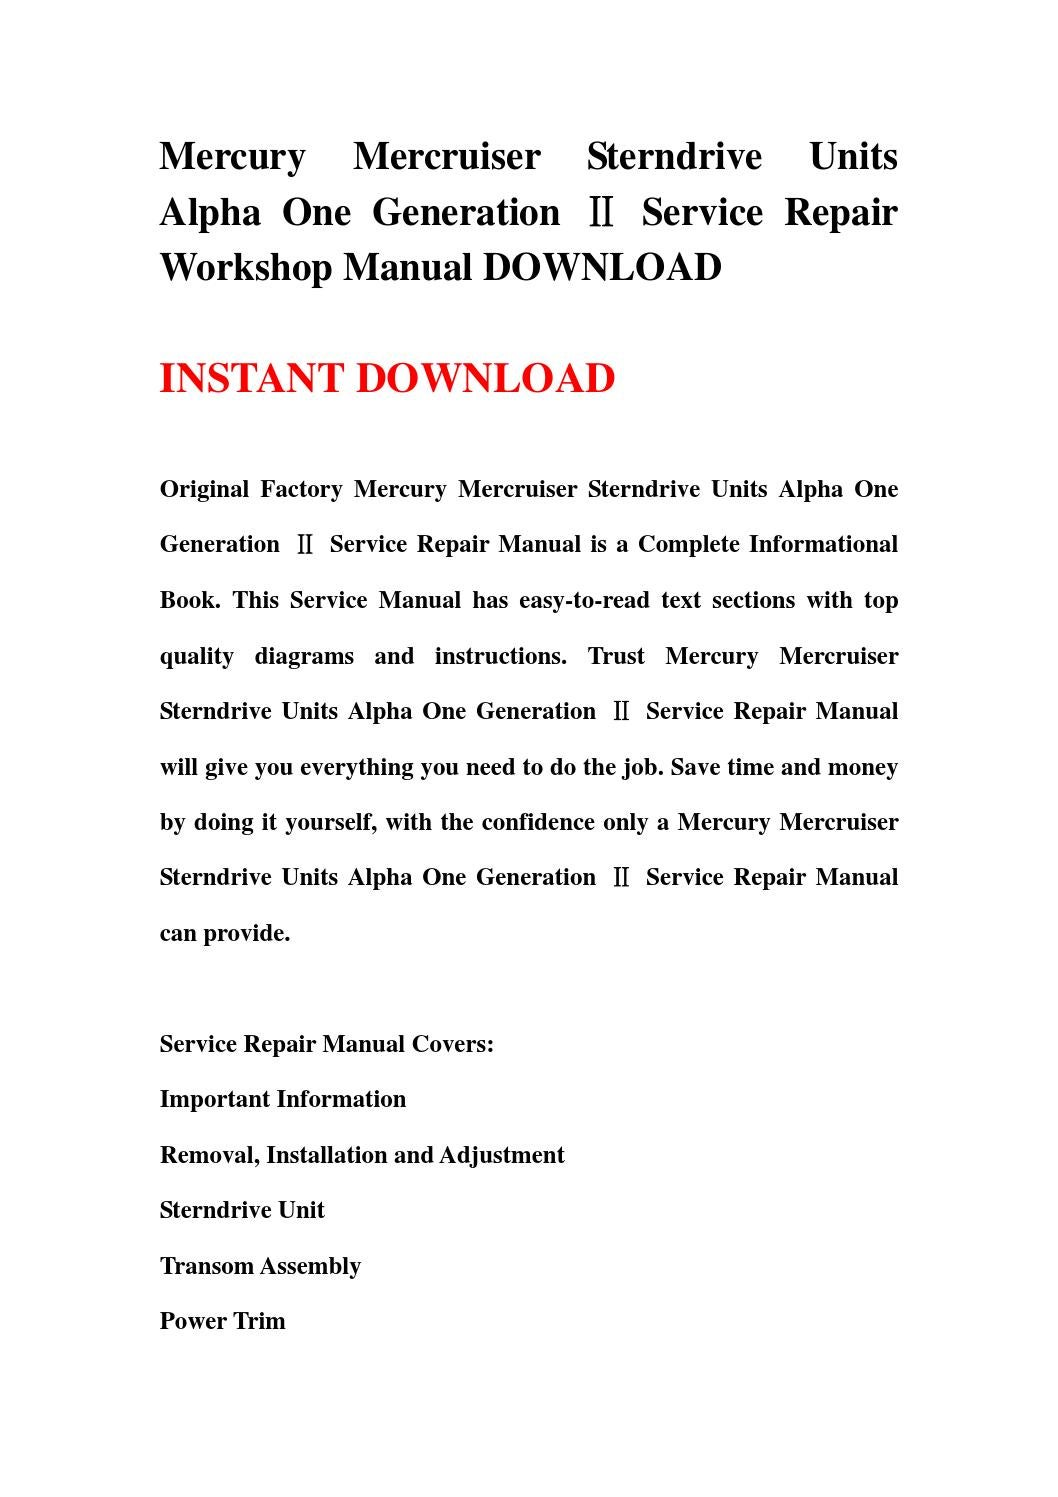 hight resolution of mercury mercruiser sterndrive units alpha one generation service repair workshop manual download